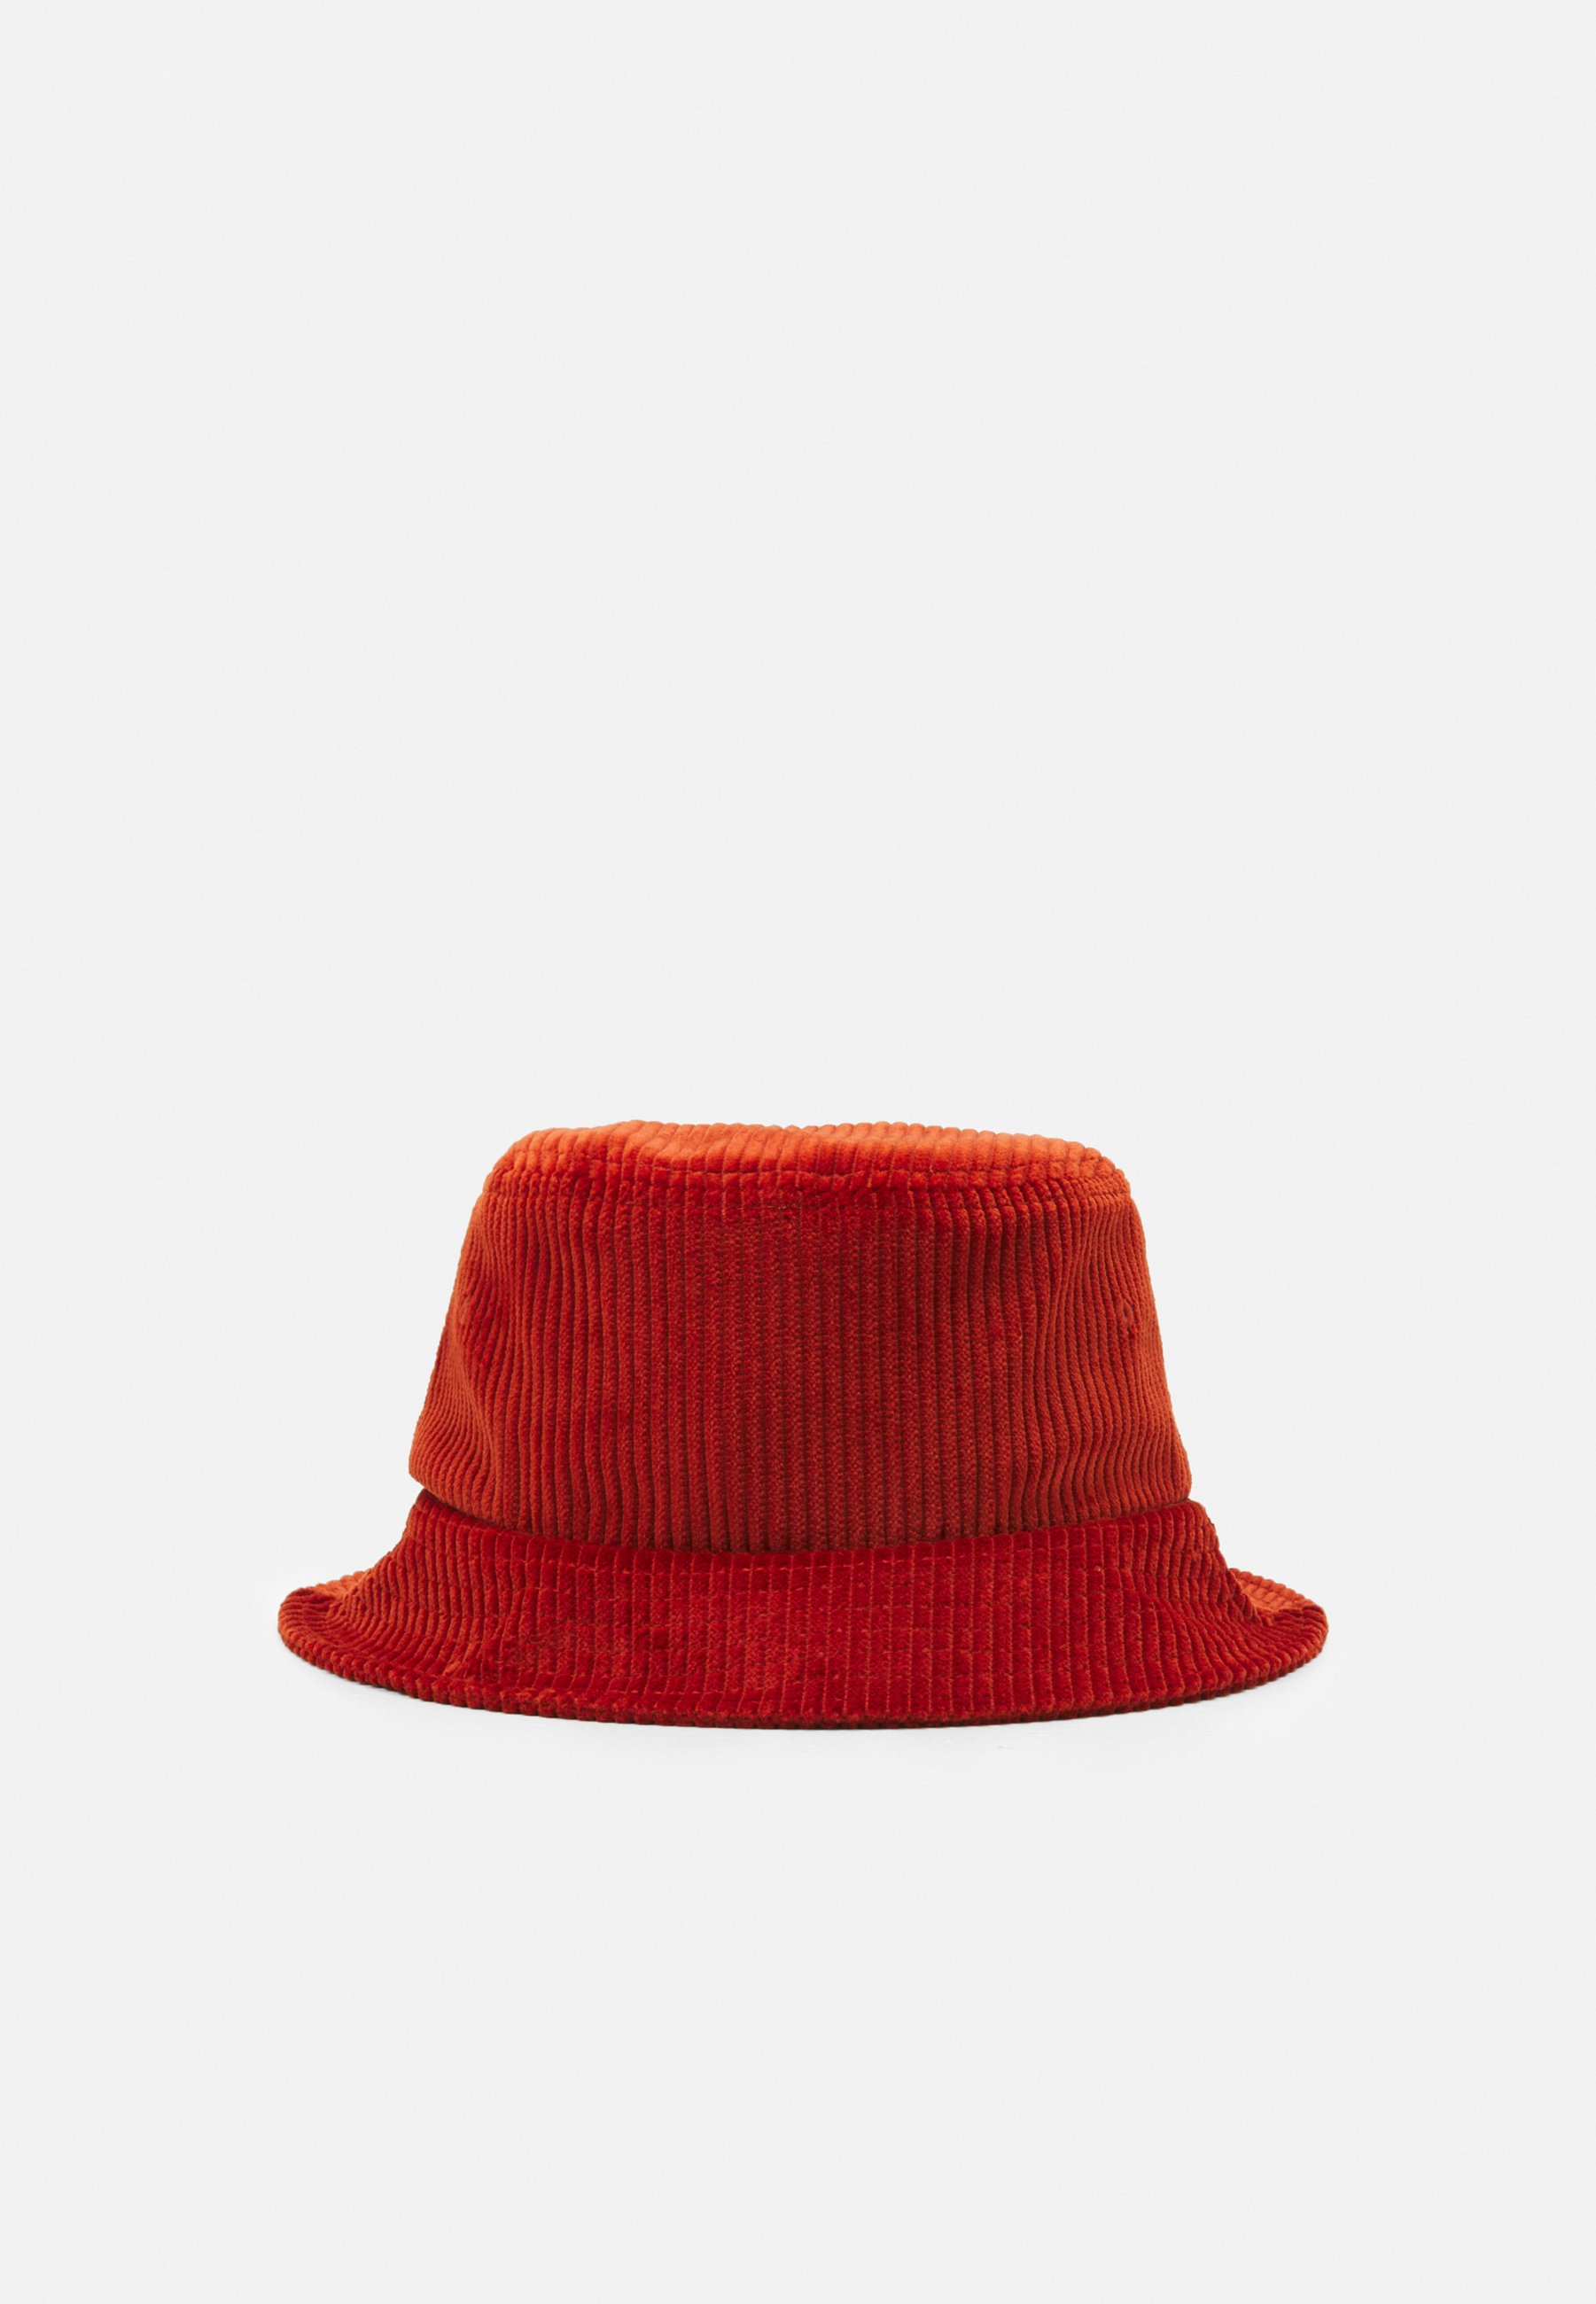 Homme BOLD BUCKET HAT UNISEX - Chapeau